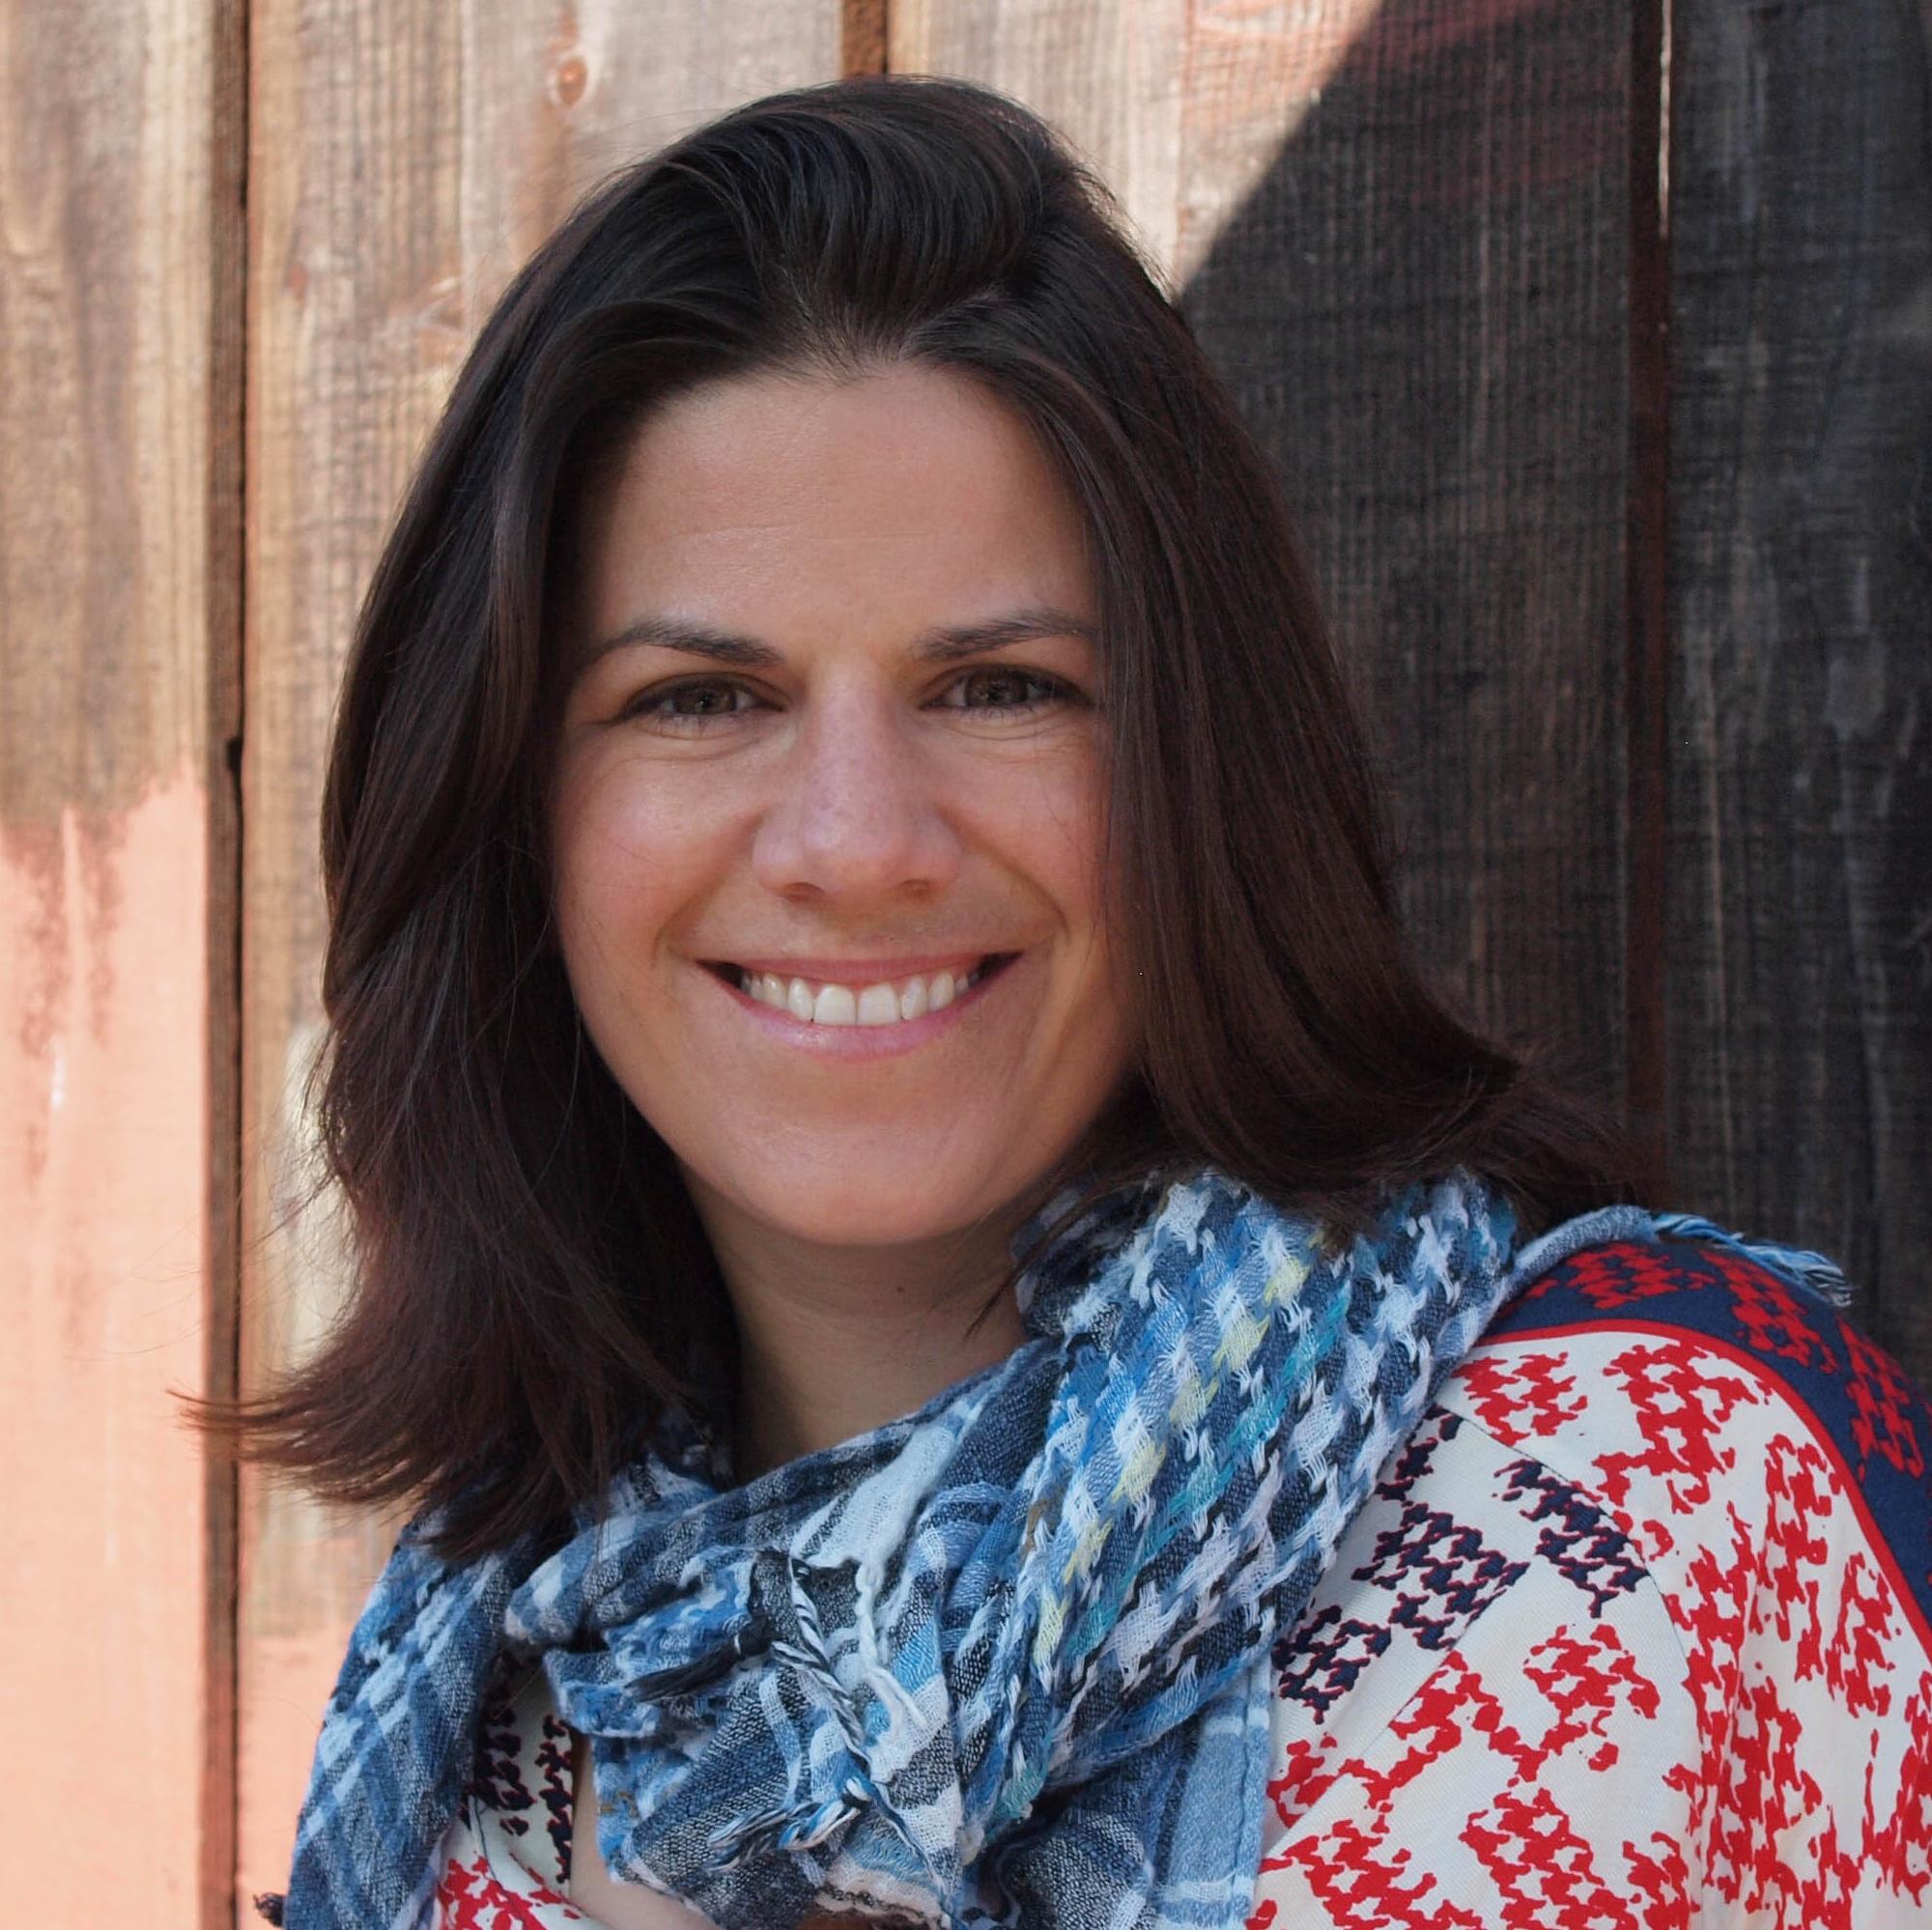 Susan Coelius Keplinger, entrepreneur